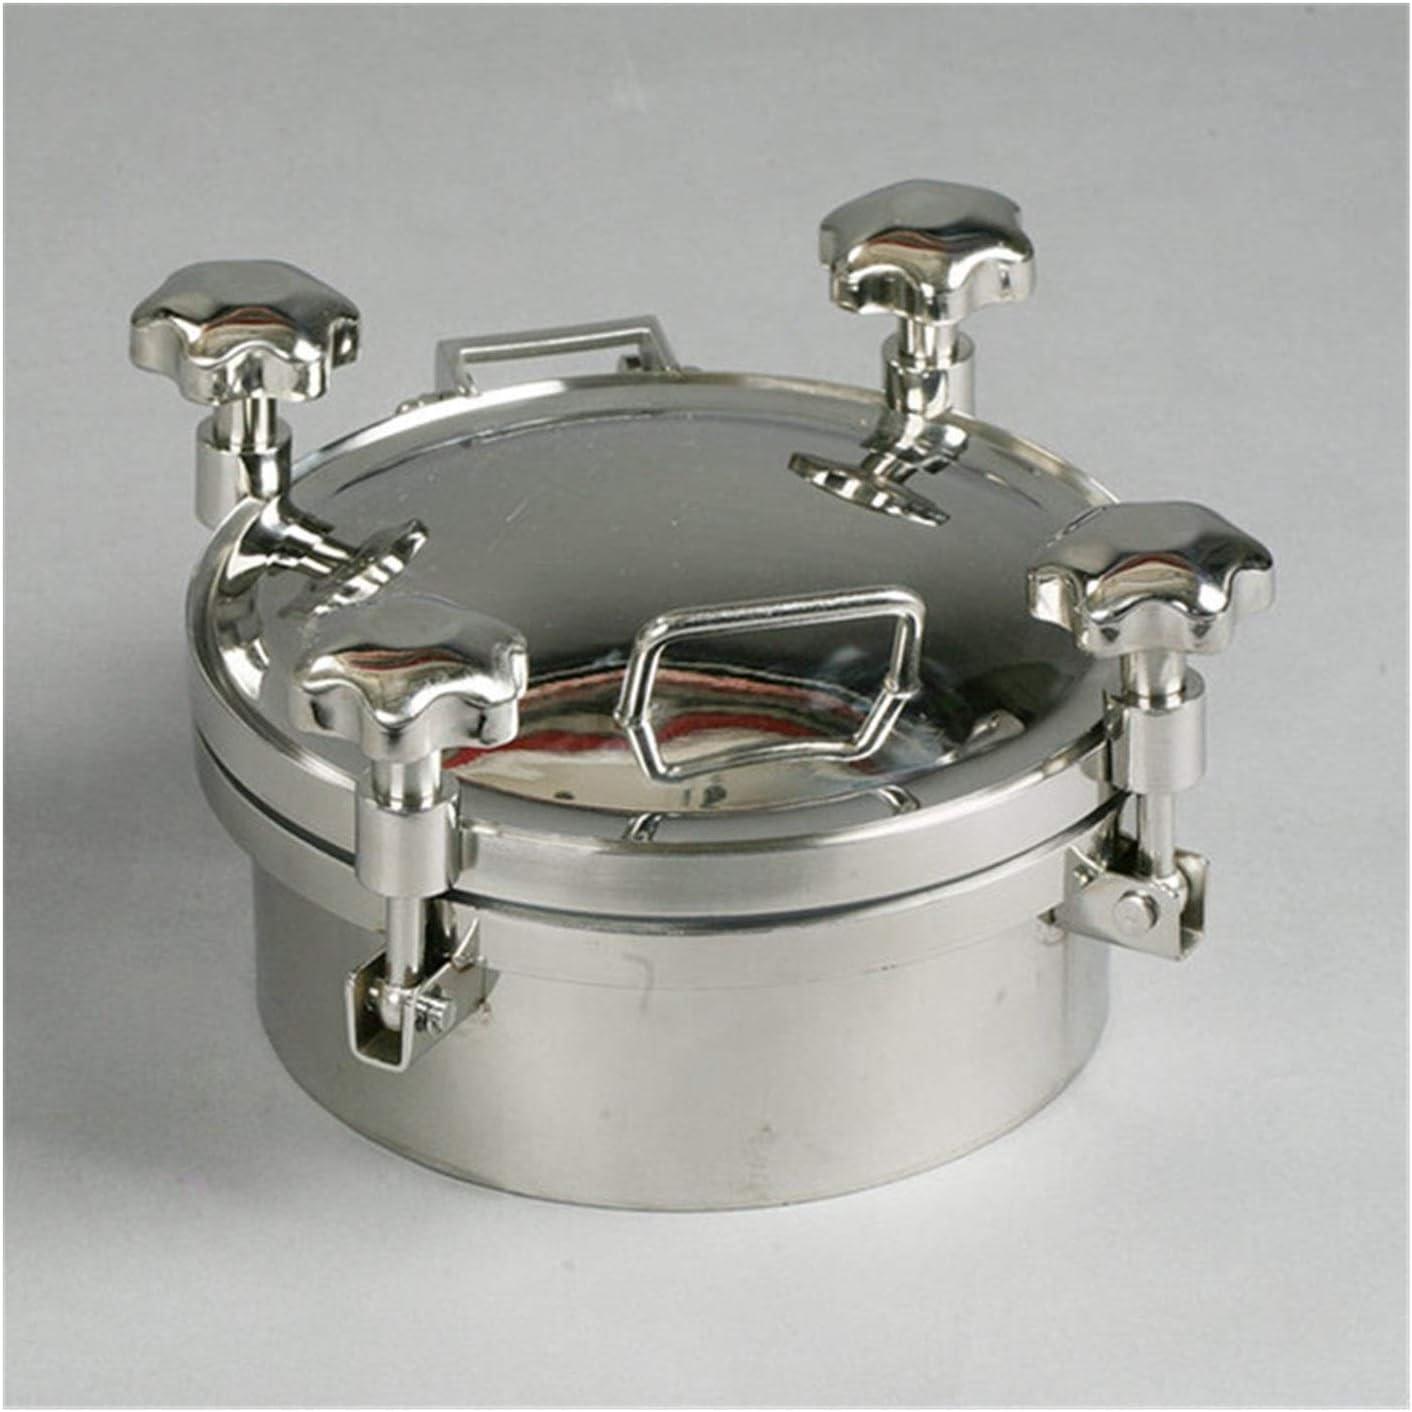 Small Equipment Accessories 200mm Round Pressure Tank Detroit Mall Manhole Nippon regular agency Co